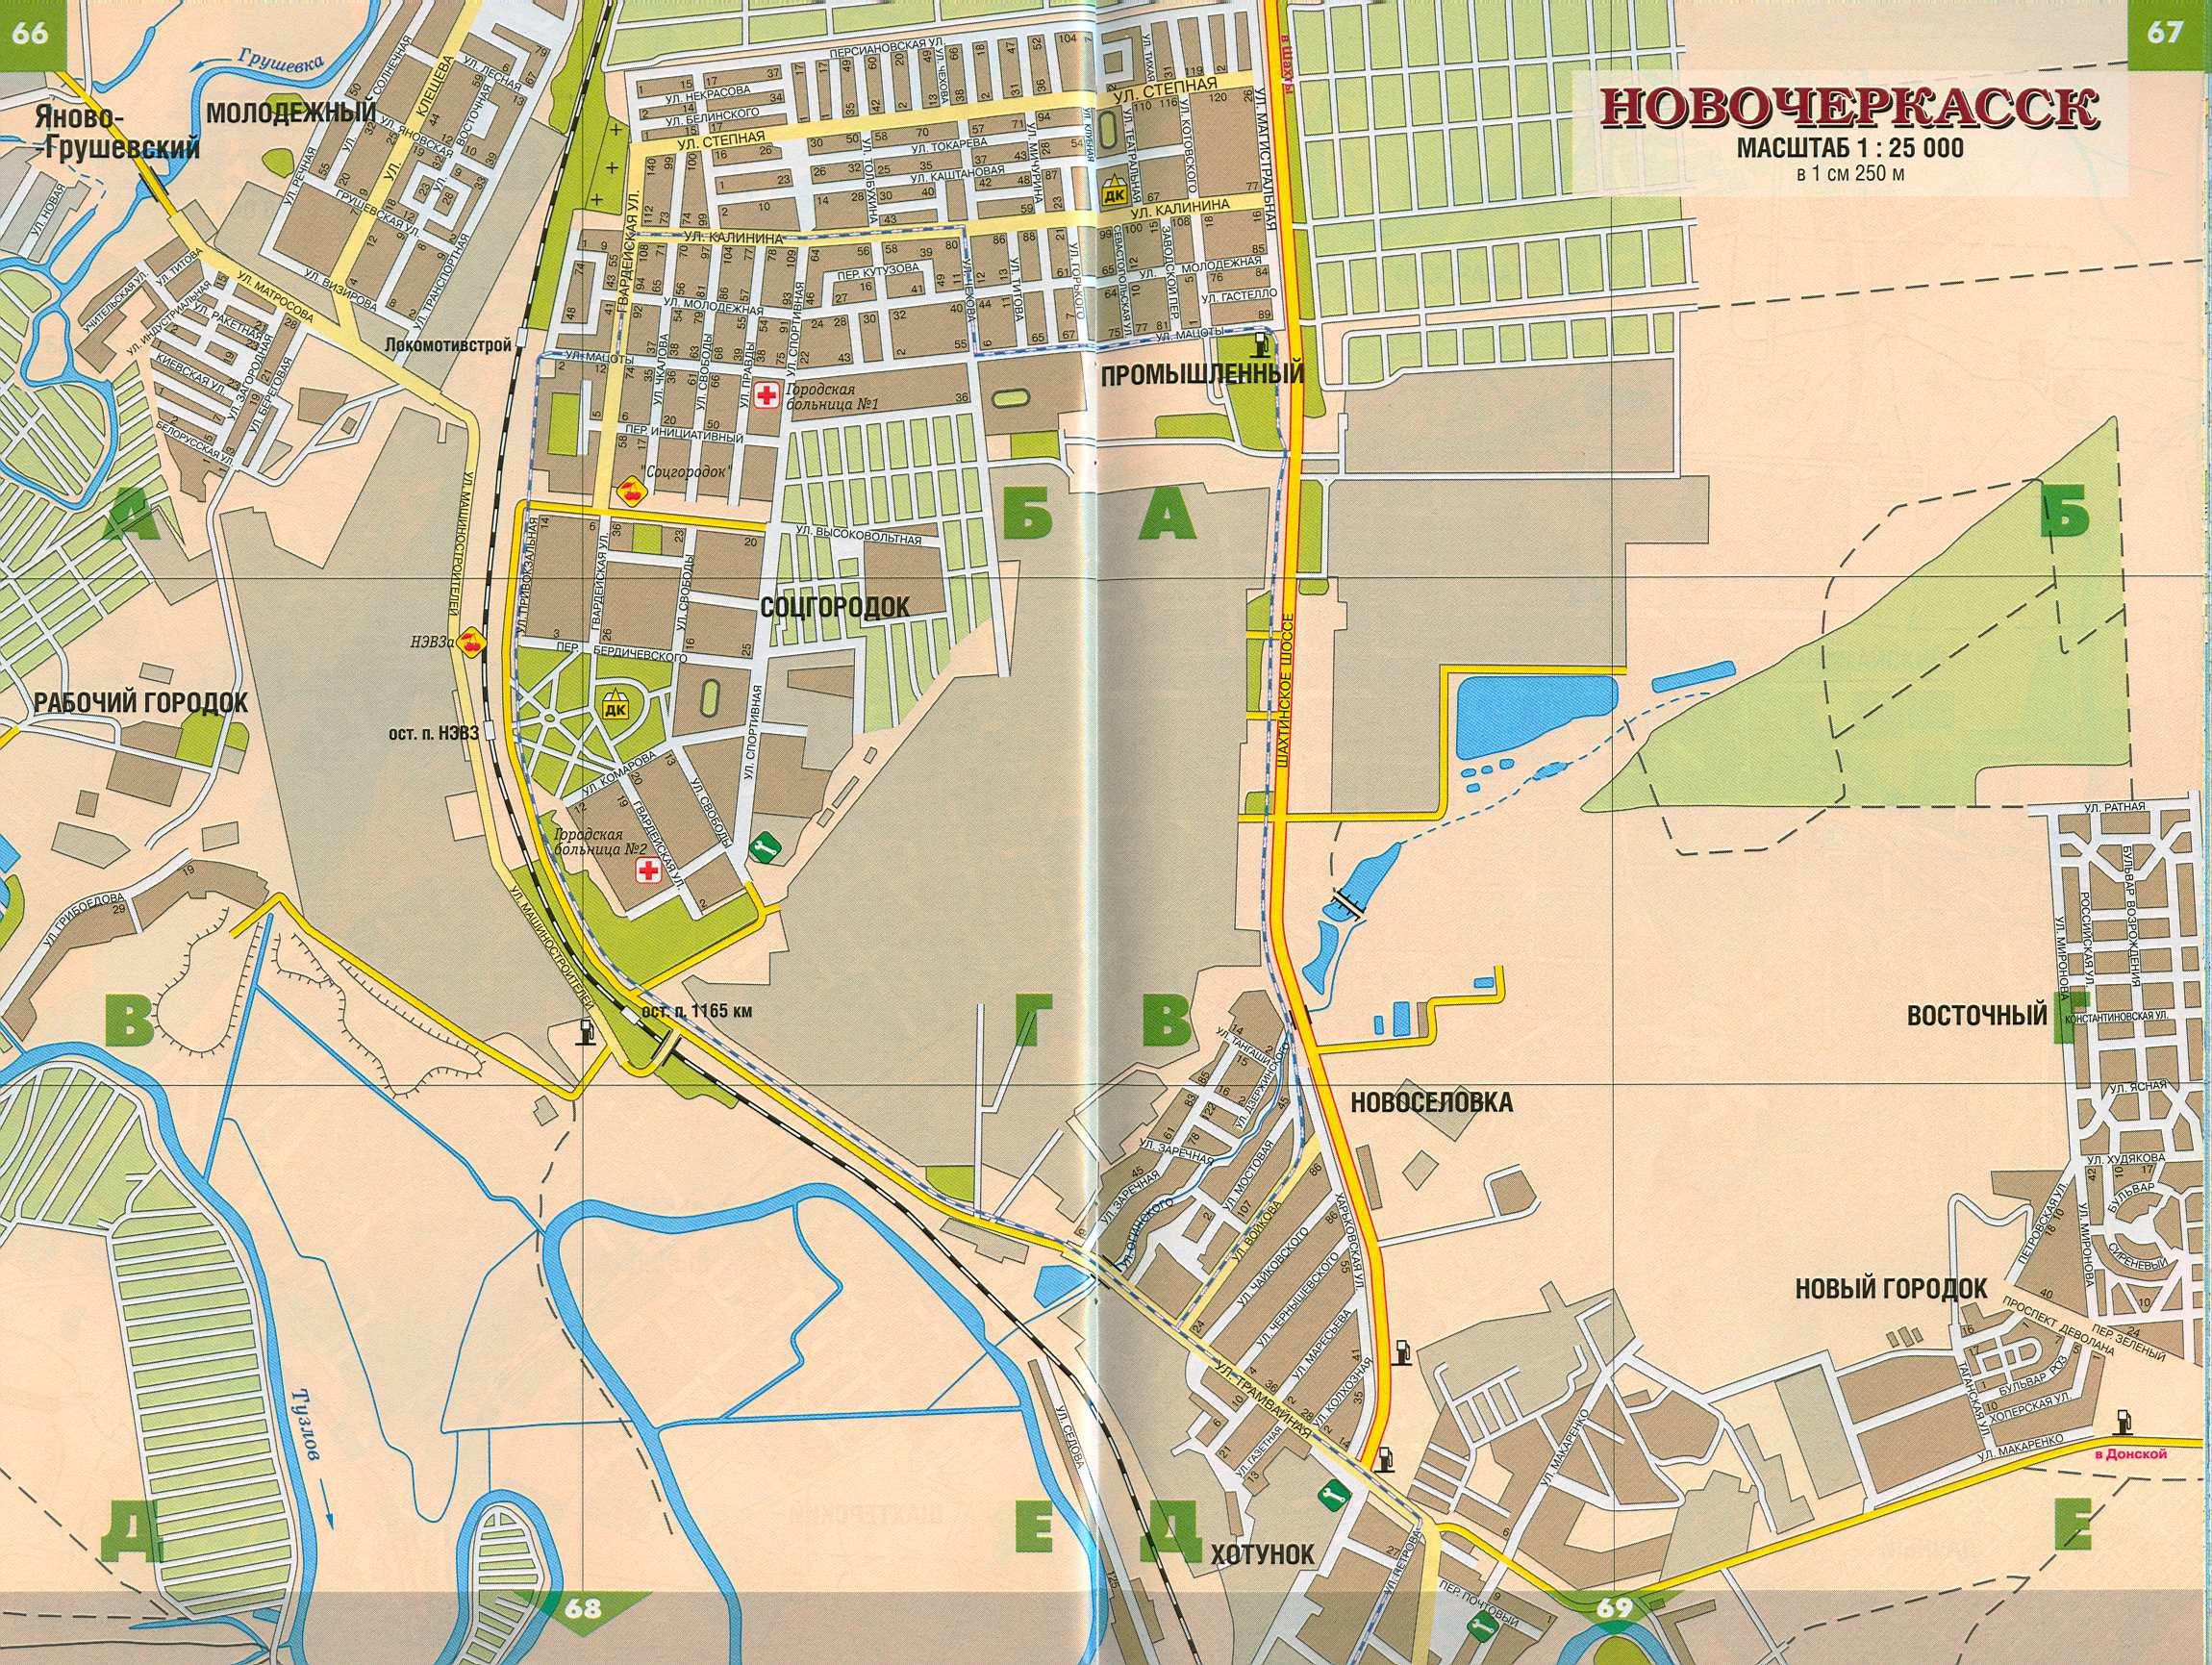 Карта Новочеркасска. Подробная карта улиц г. Новочеркасск ...: http://www.raster-maps.com/map-of-russia-330/